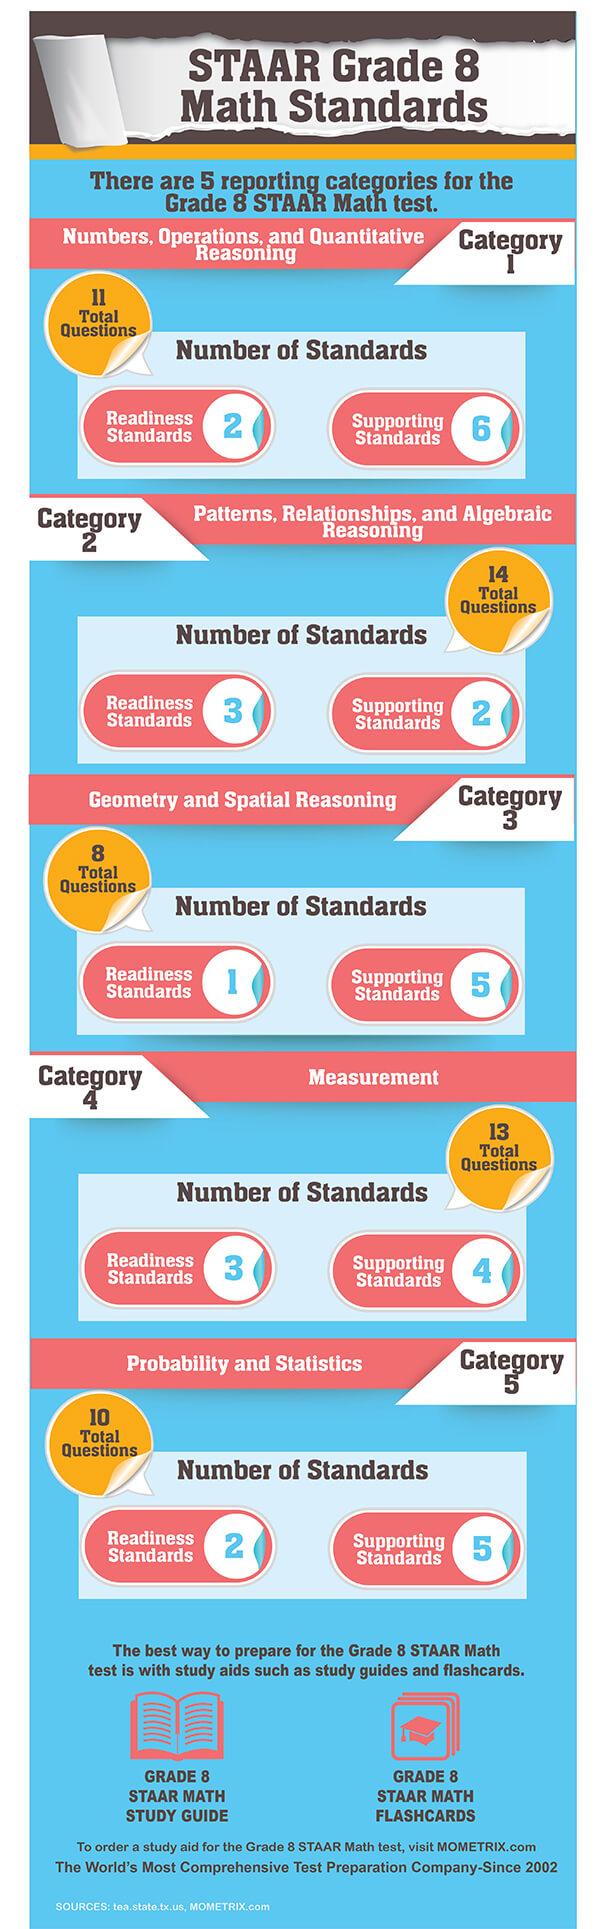 Free Staar Mathematics Grade 8 Practice Test Questions